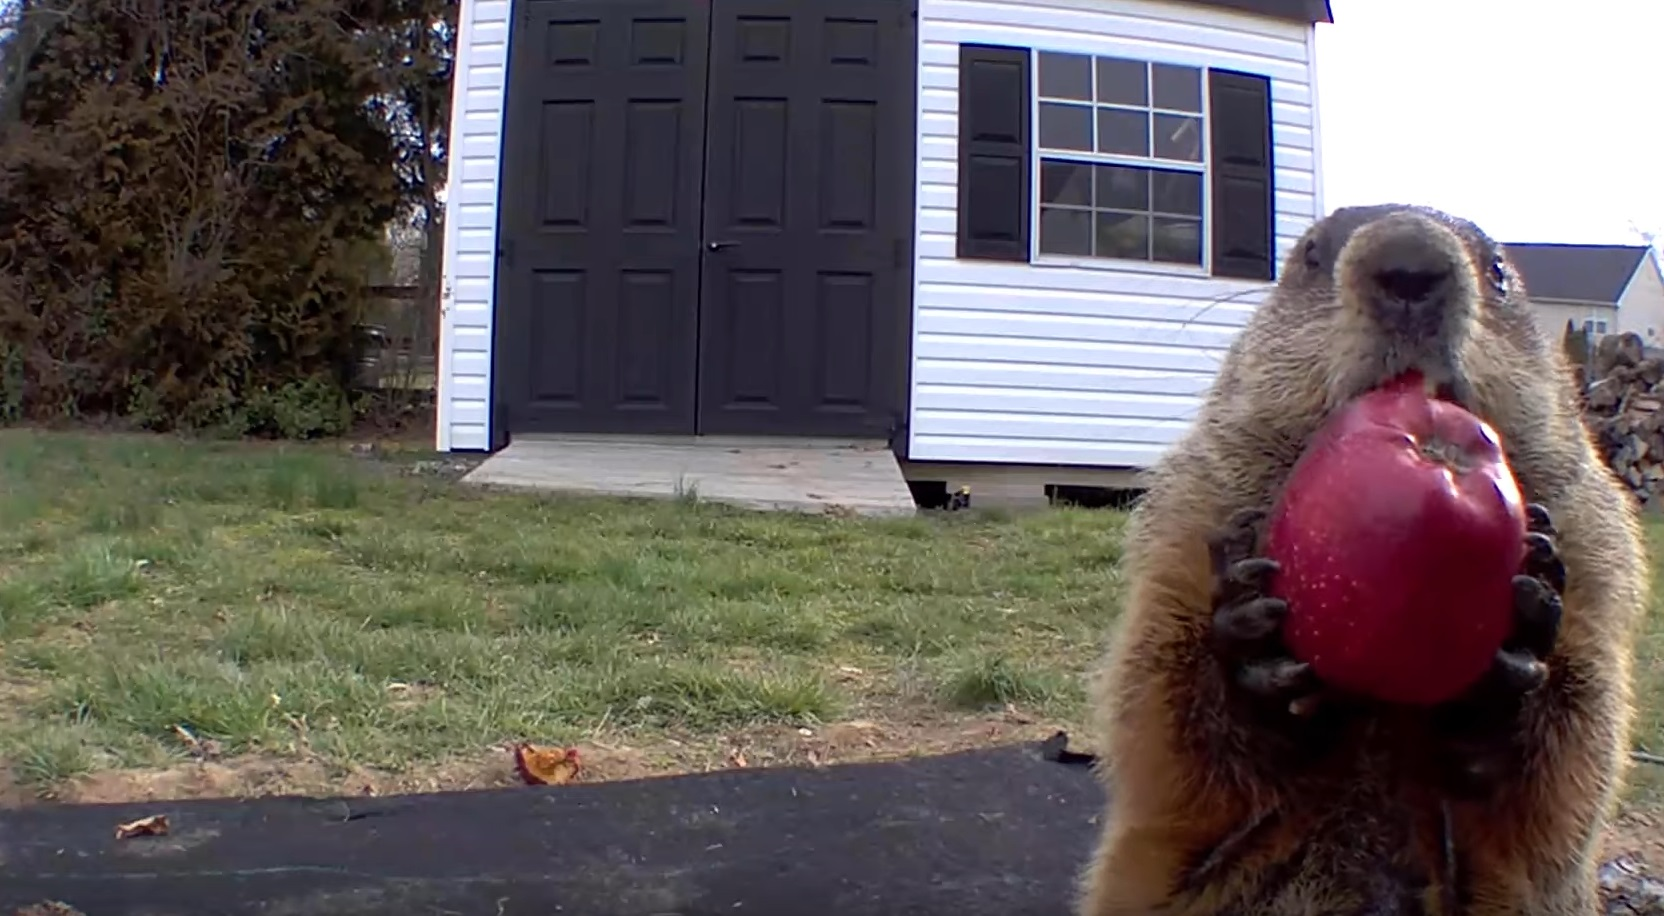 Chunk The Groundhog Eating Apples